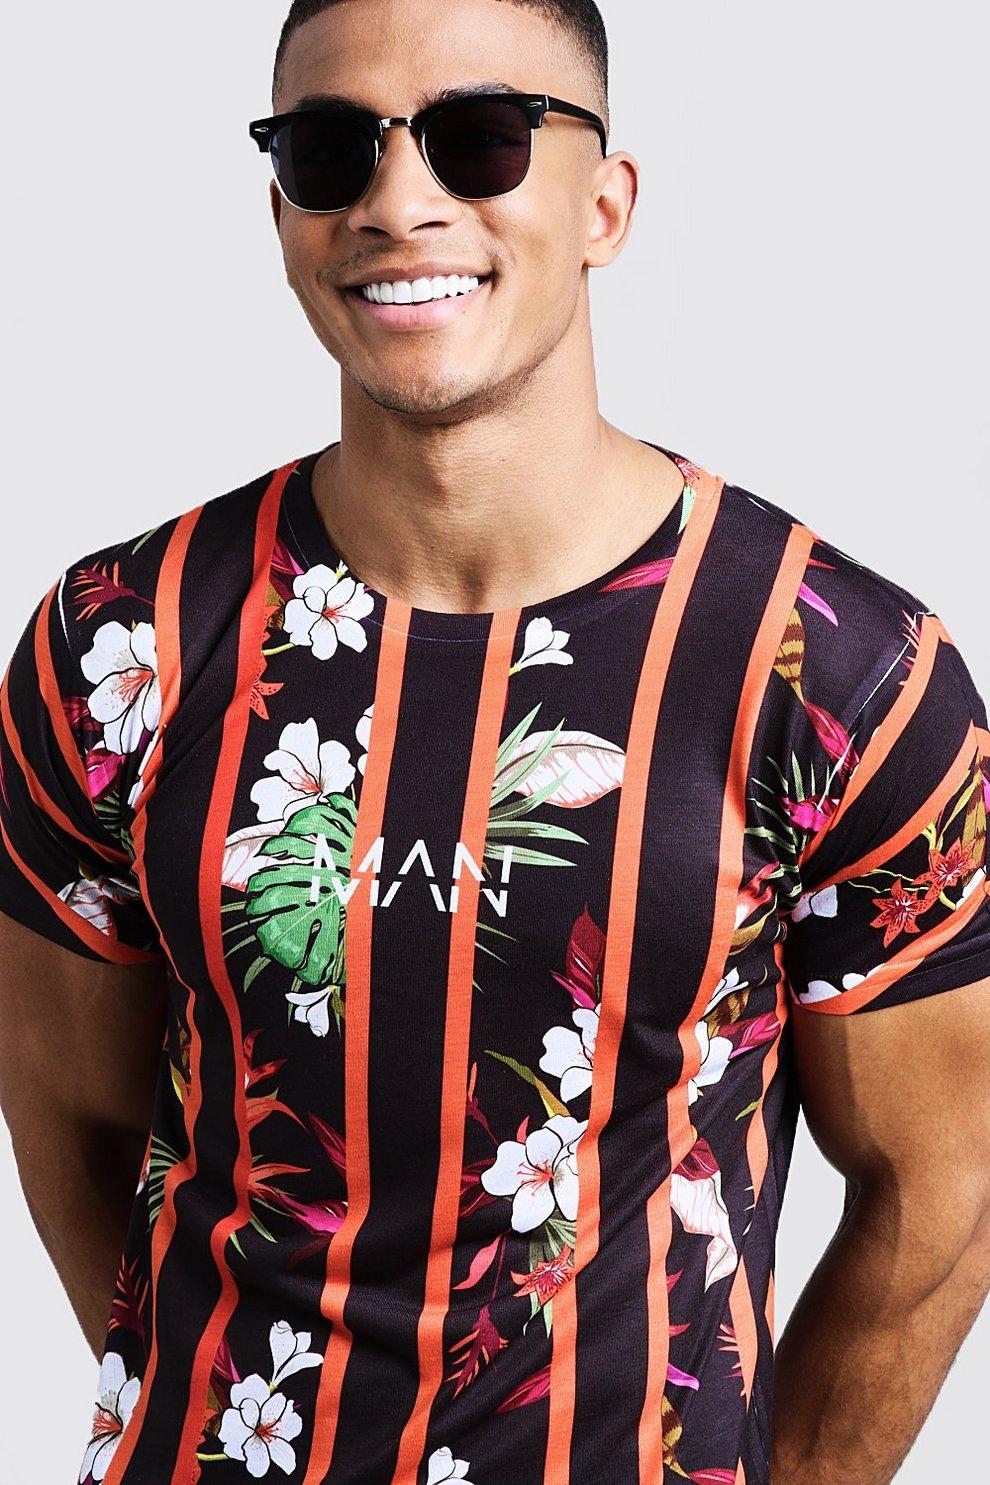 215f6ce300c Original MAN Stripe Floral Printed T-Shirt - boohooMAN